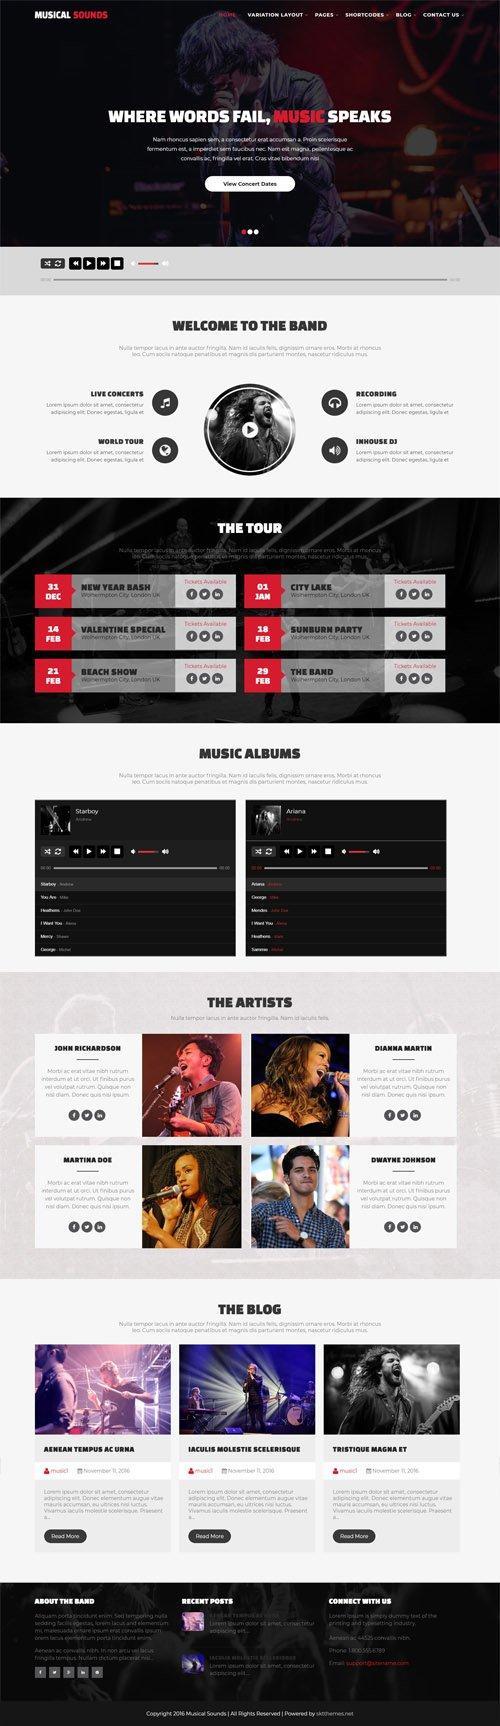 SKT Themes - Musical Sounds v1.0 - Responsive WordPress Theme